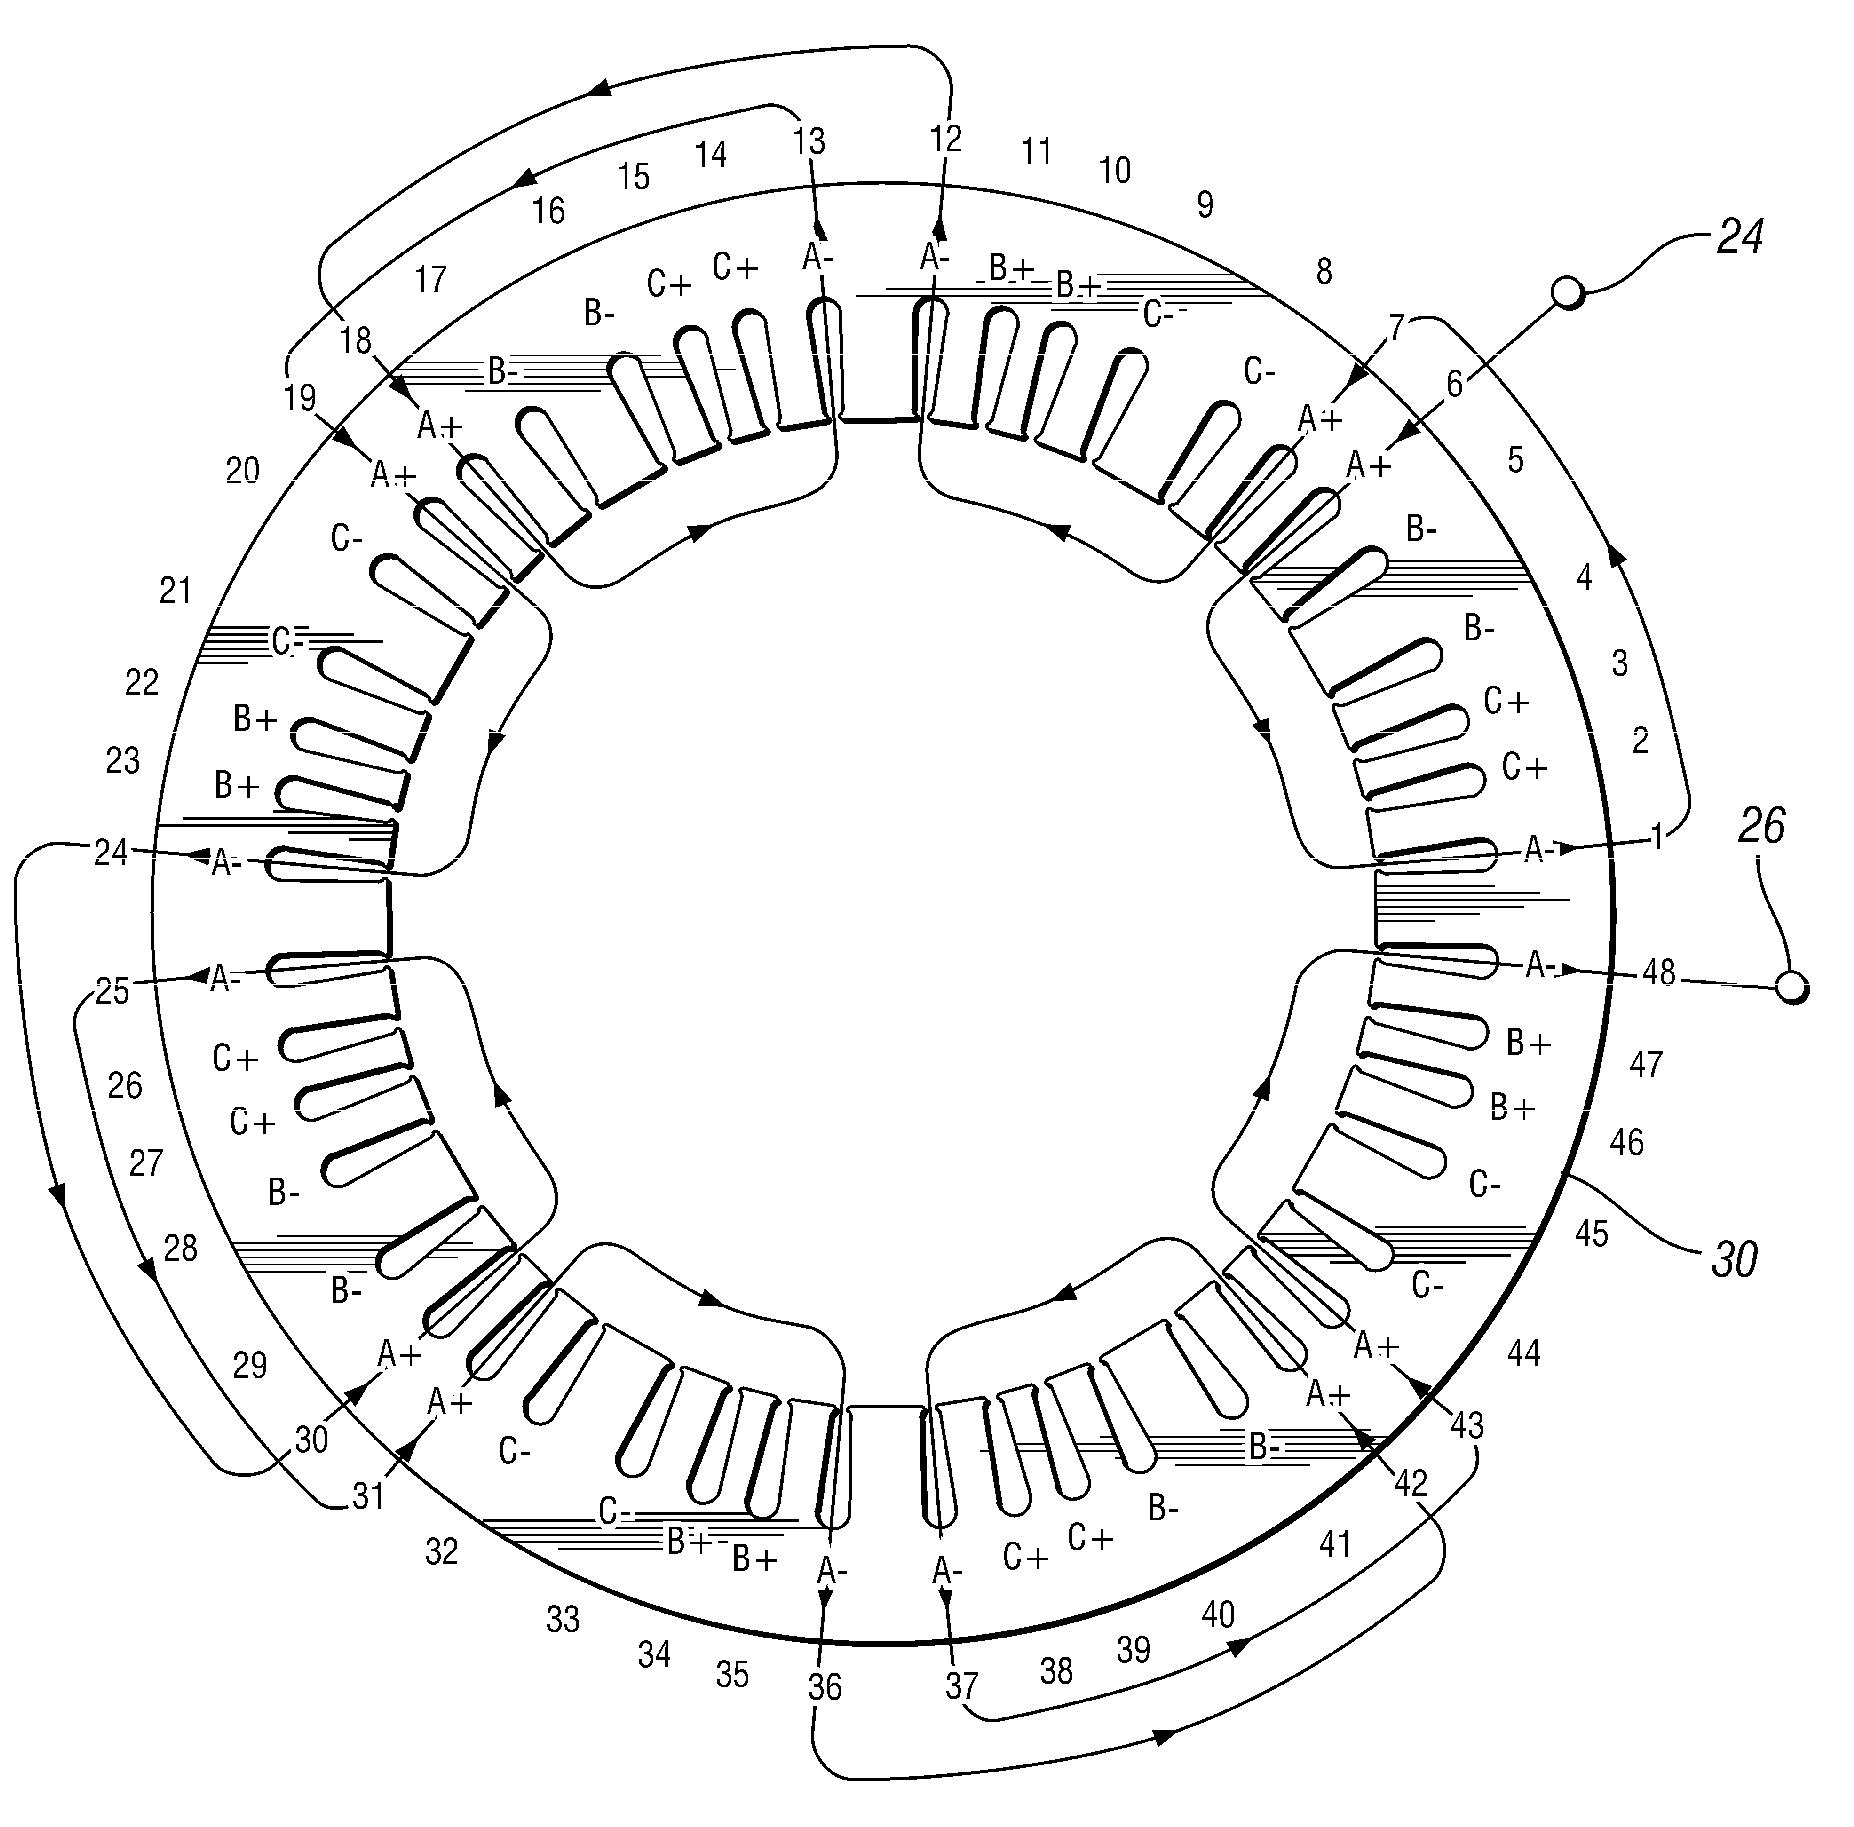 hight resolution of 11 pole stator wiring diagram